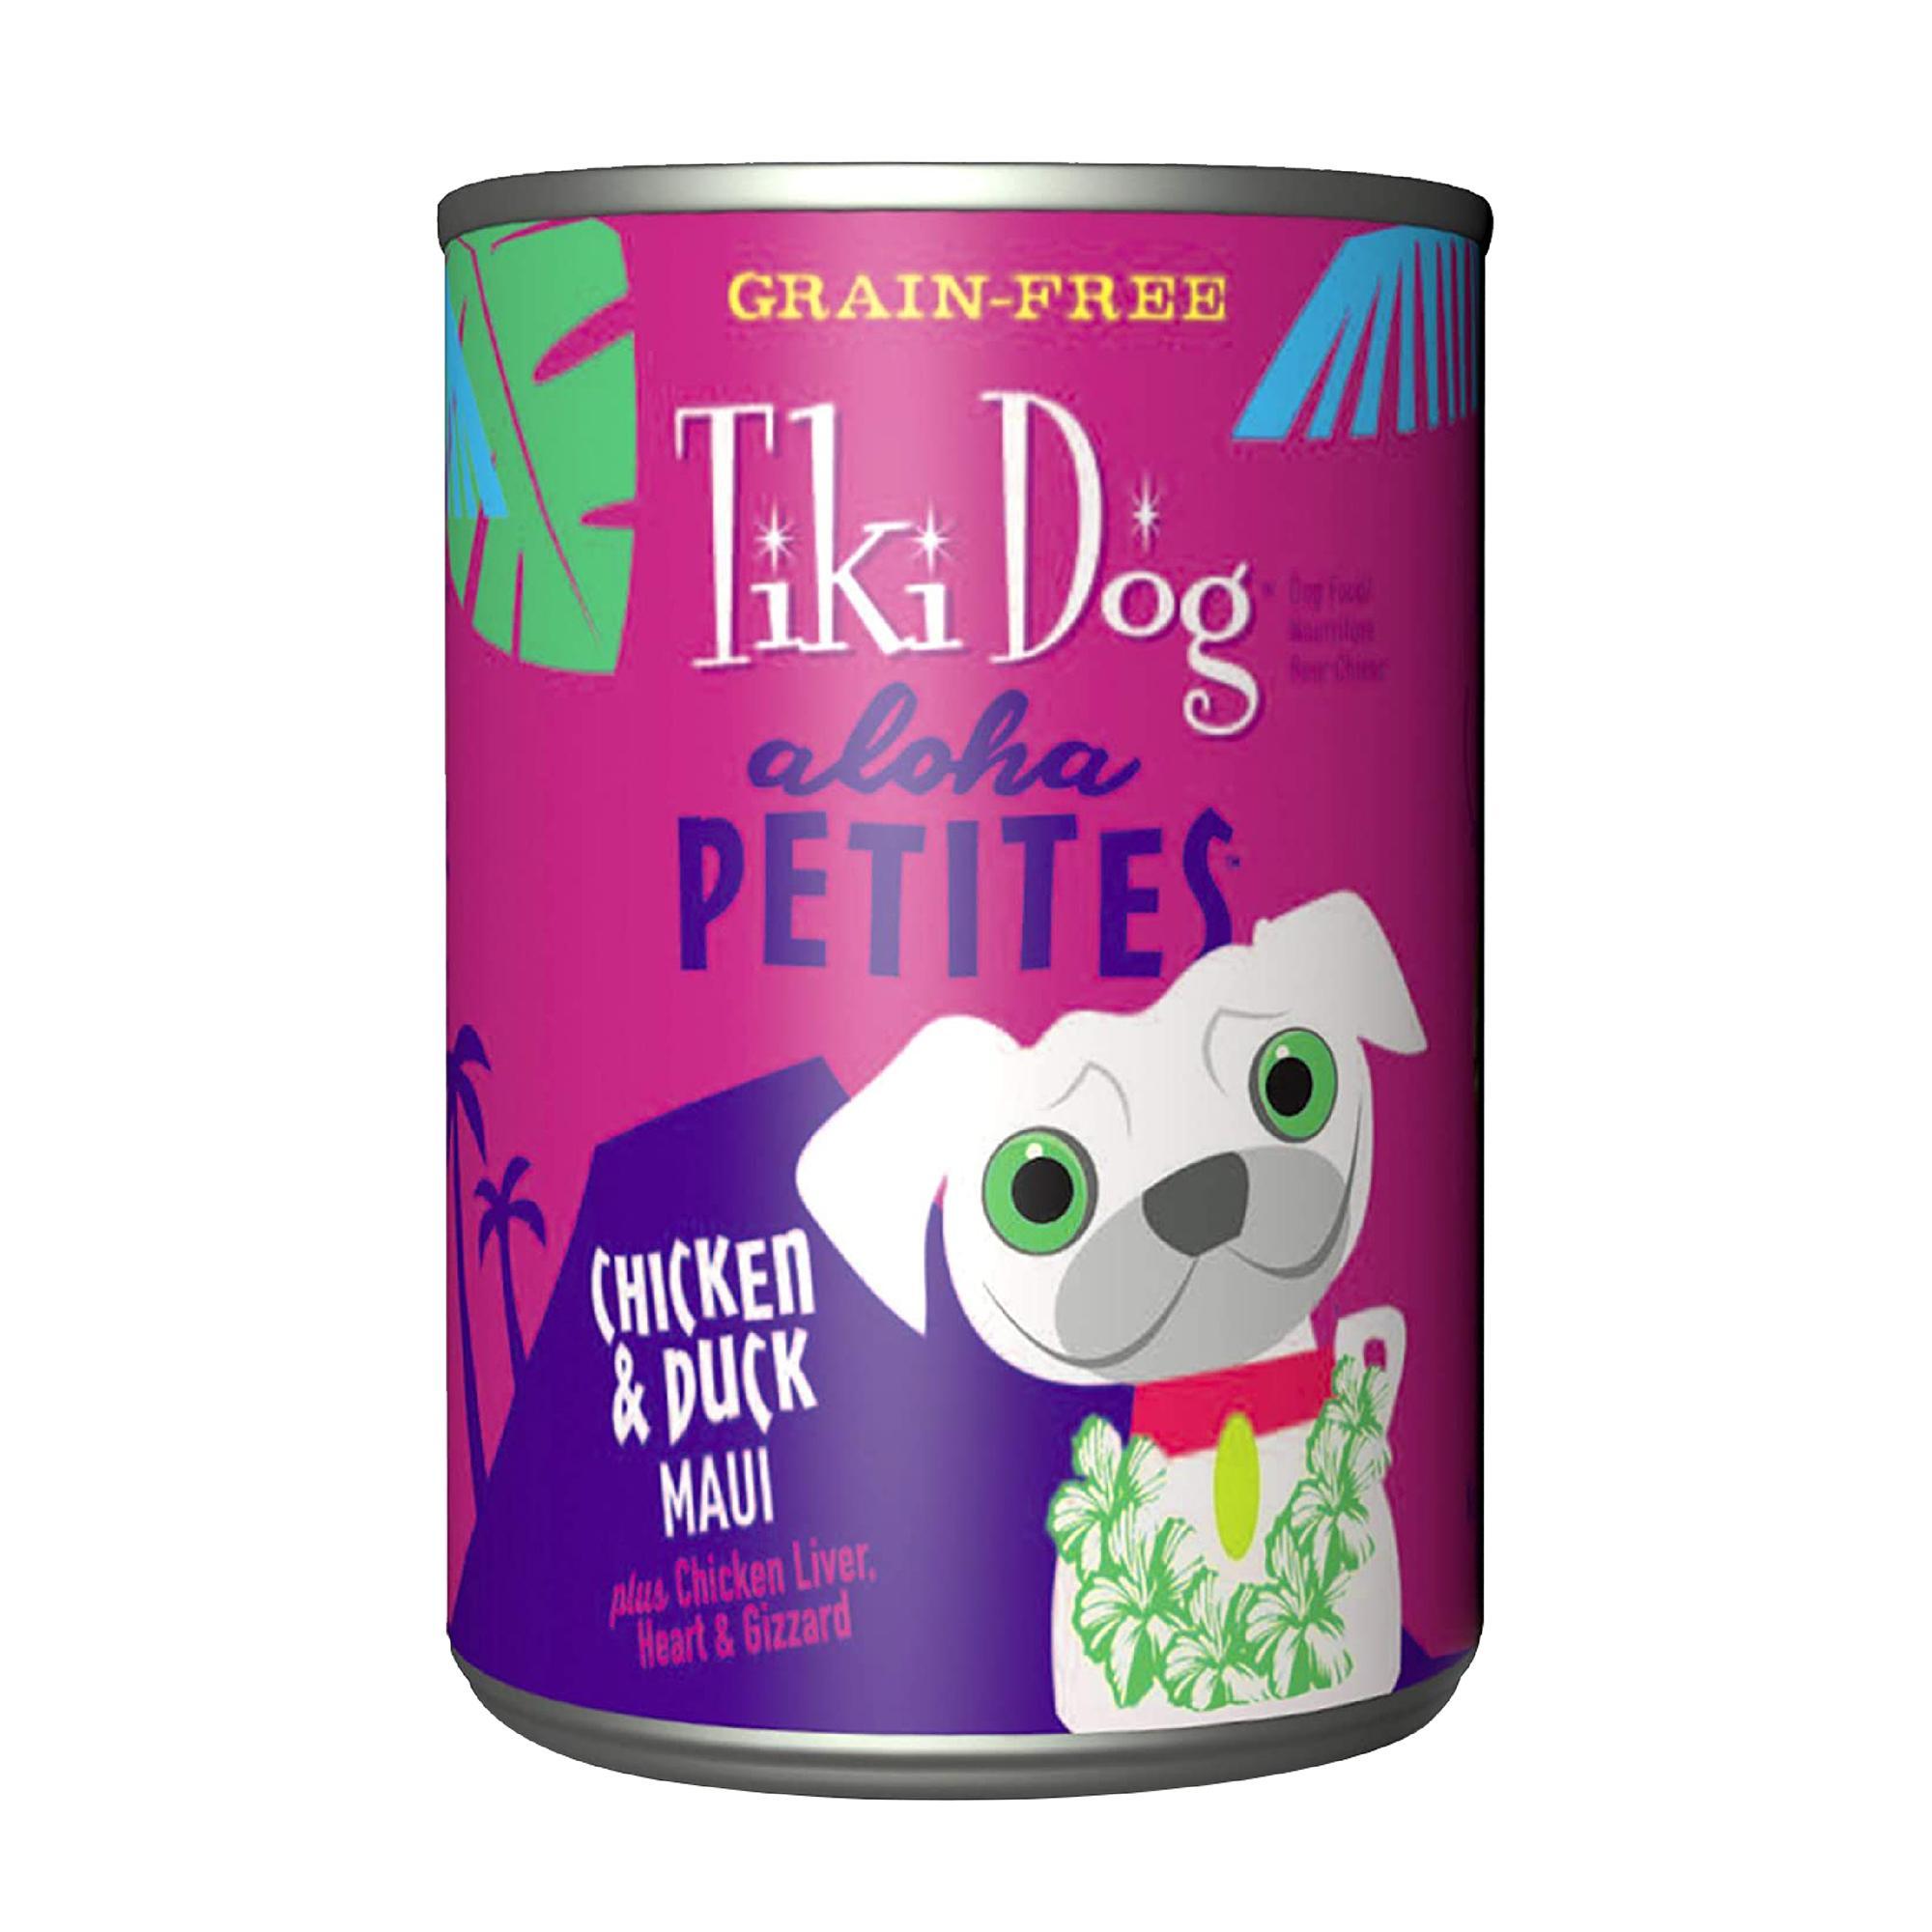 Tiki Dog Aloha Petites Chicken & Duck Maui Wet Dog Food, 9-oz can, case of 8